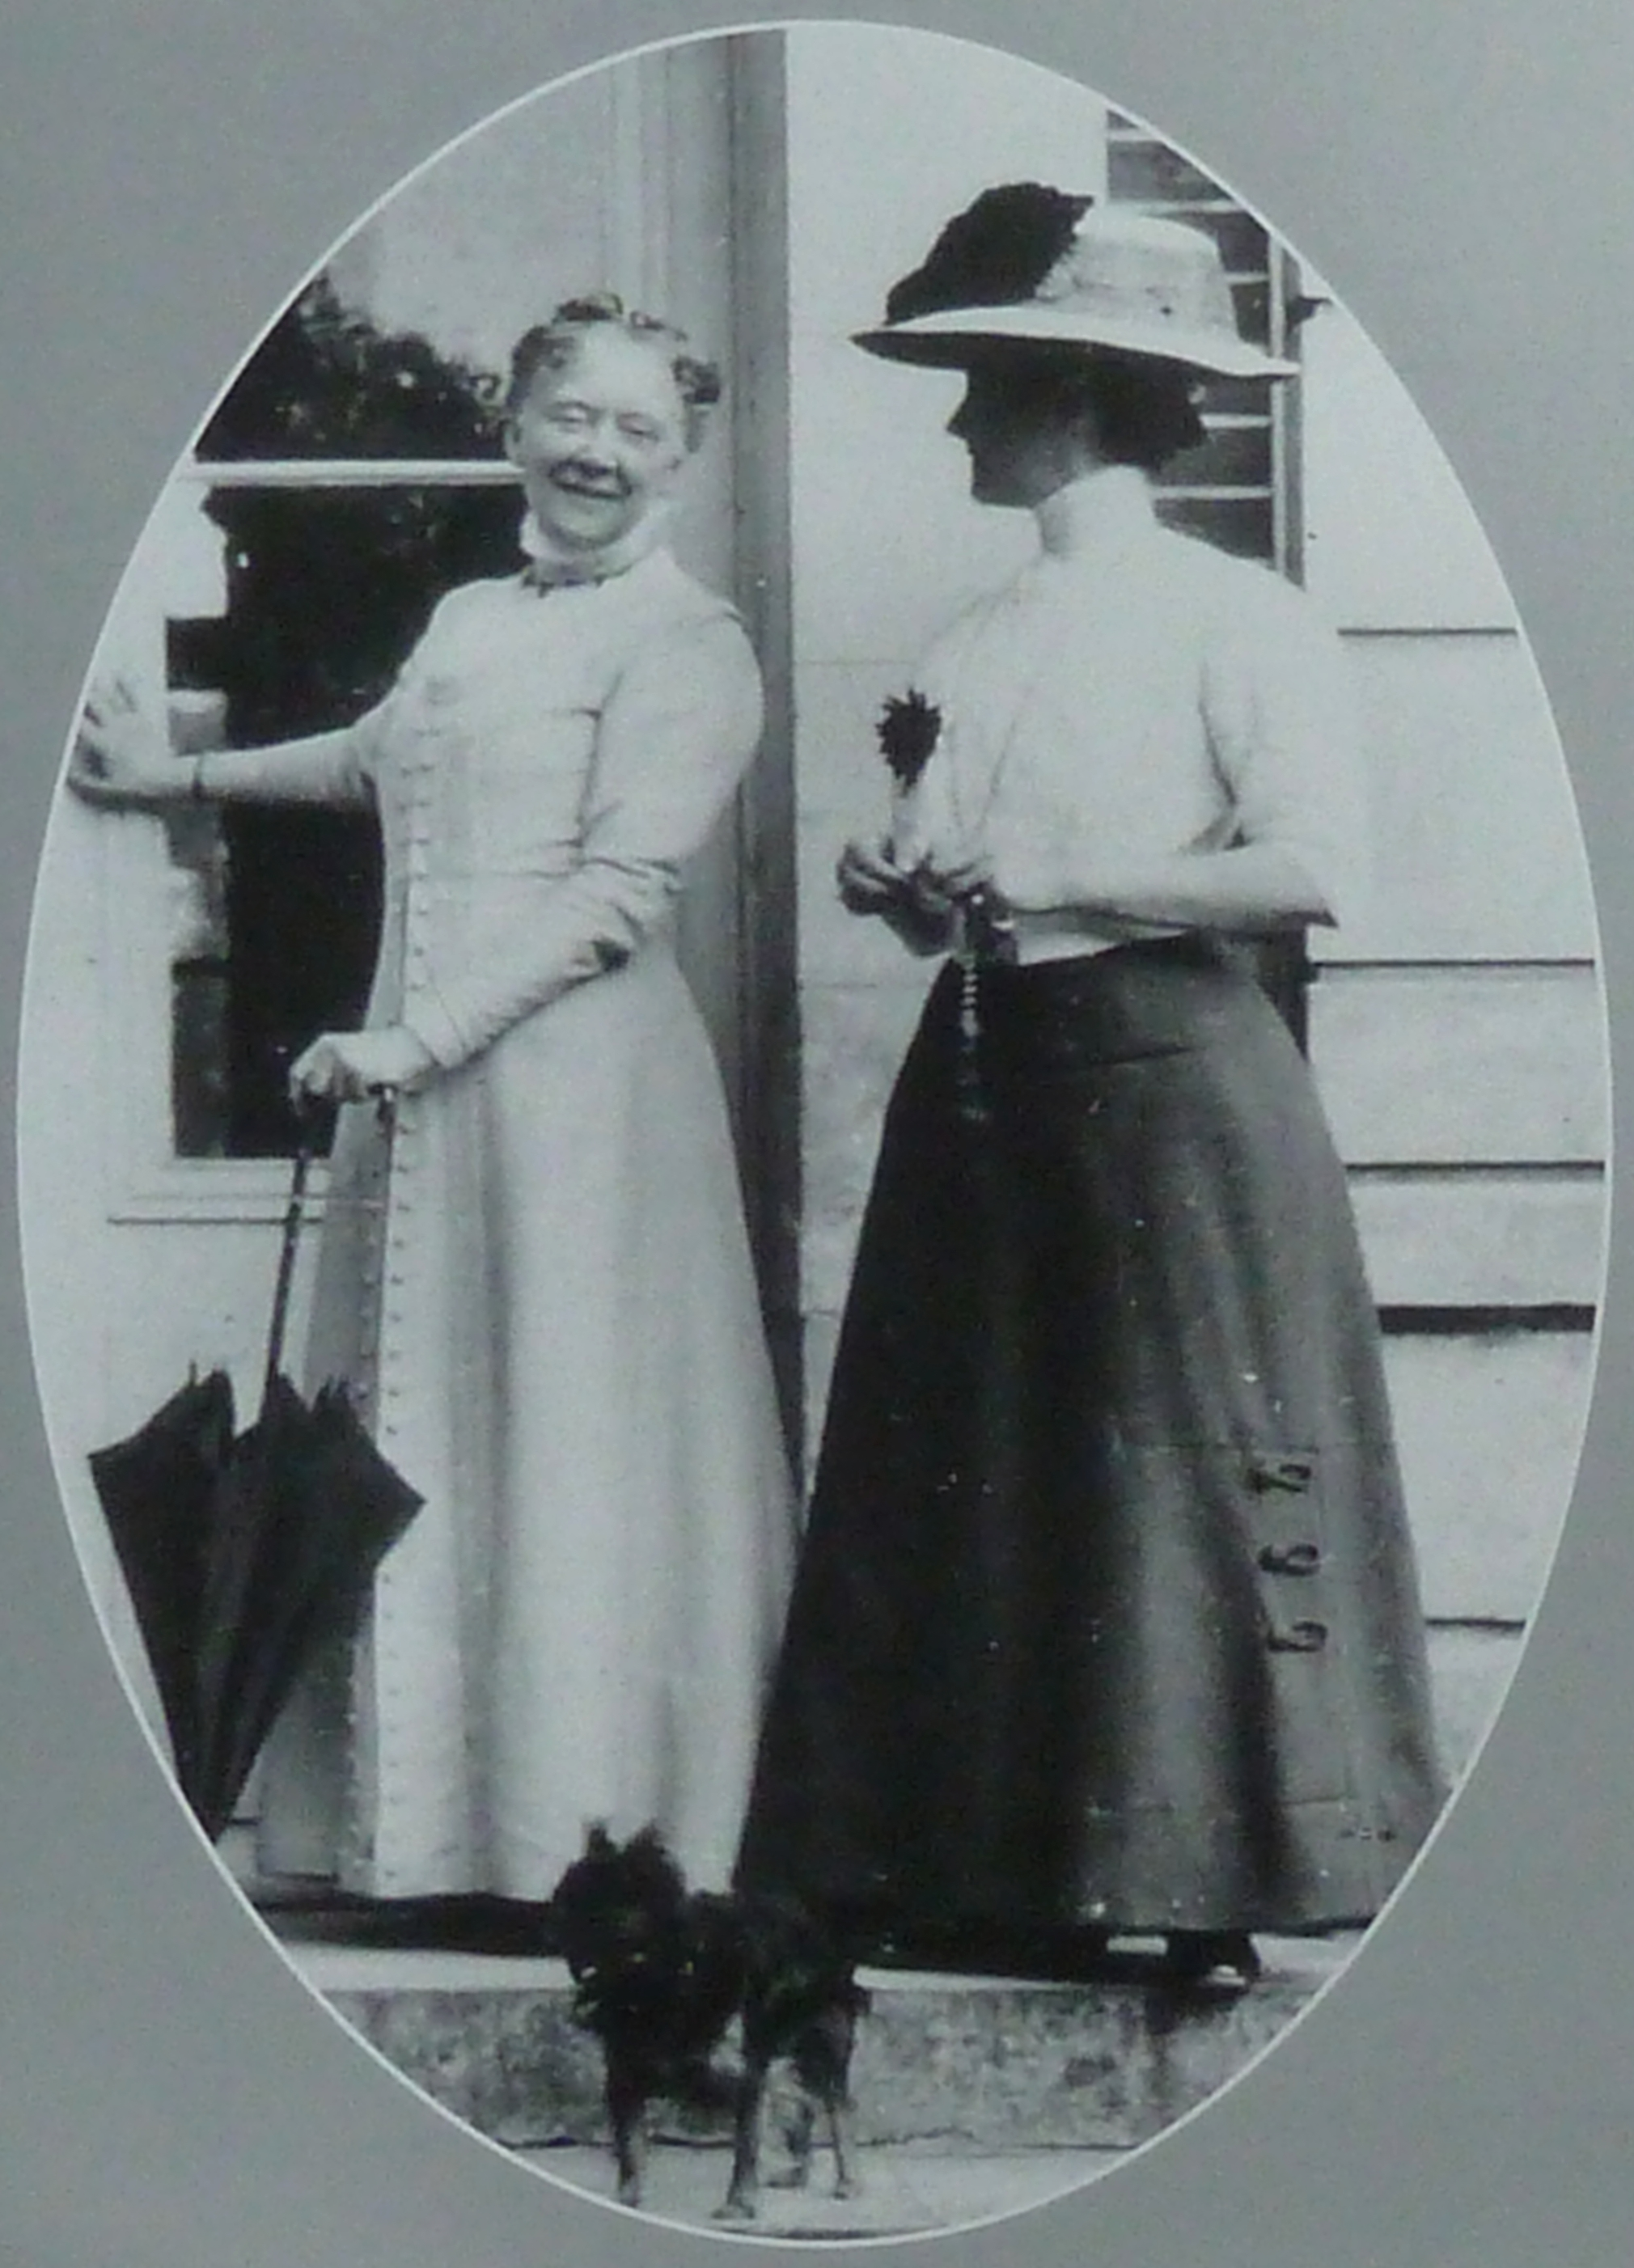 Mary Chaplin Artiste Peintre mary cassatt — wikipédia